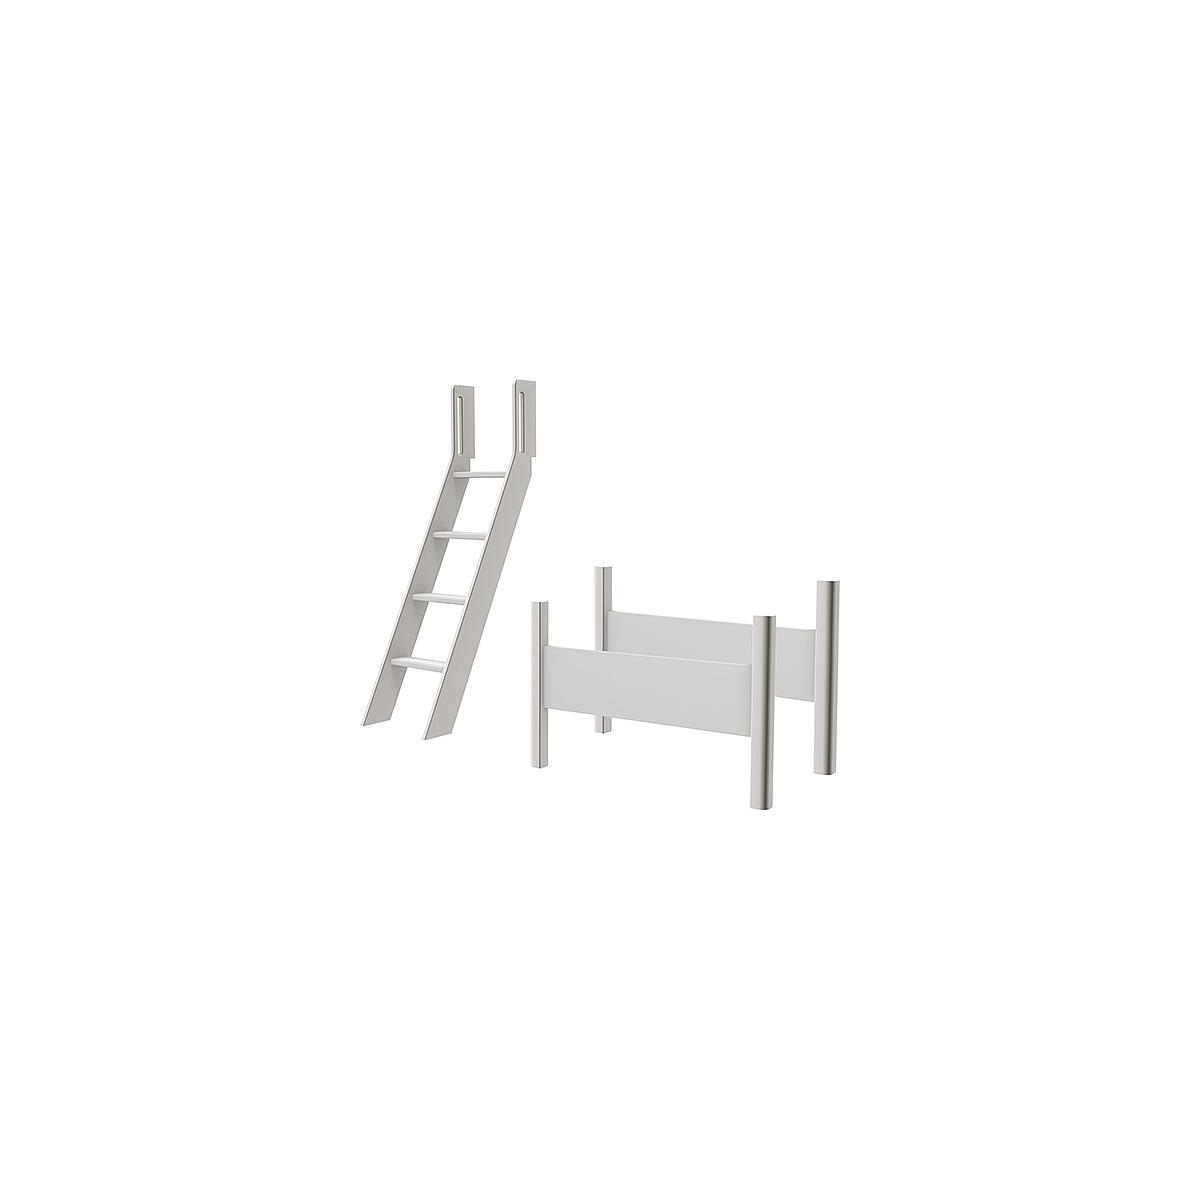 Kit elevación Cama semi alta WHITE Flexa escalera inclinada blanco